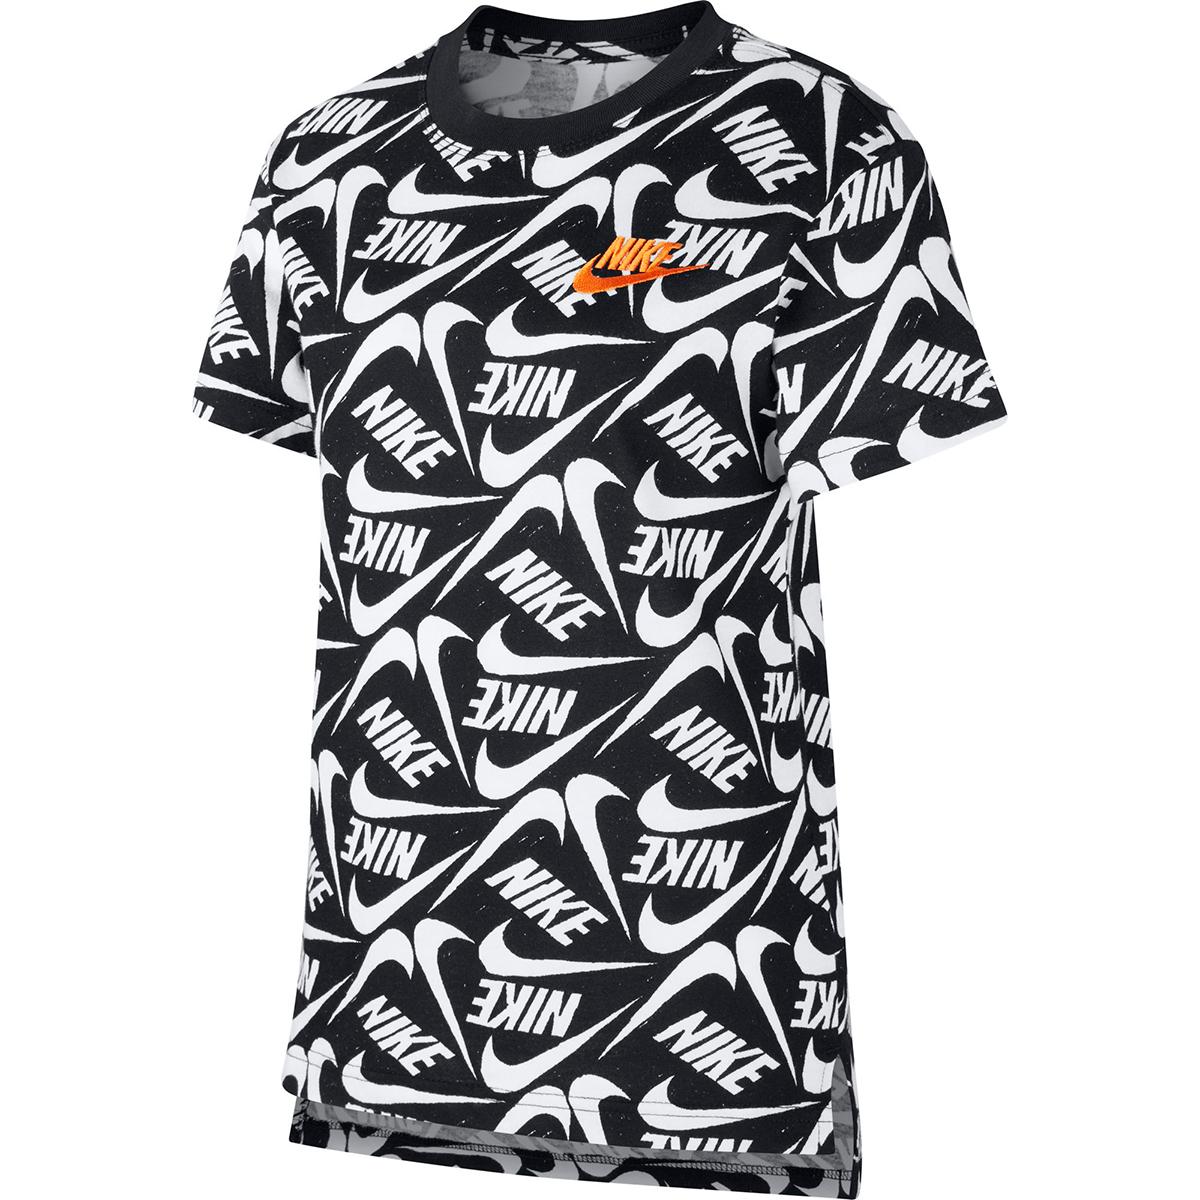 Nike Girls' Short-Sleeve Swoosh Logo Tee - Black, S